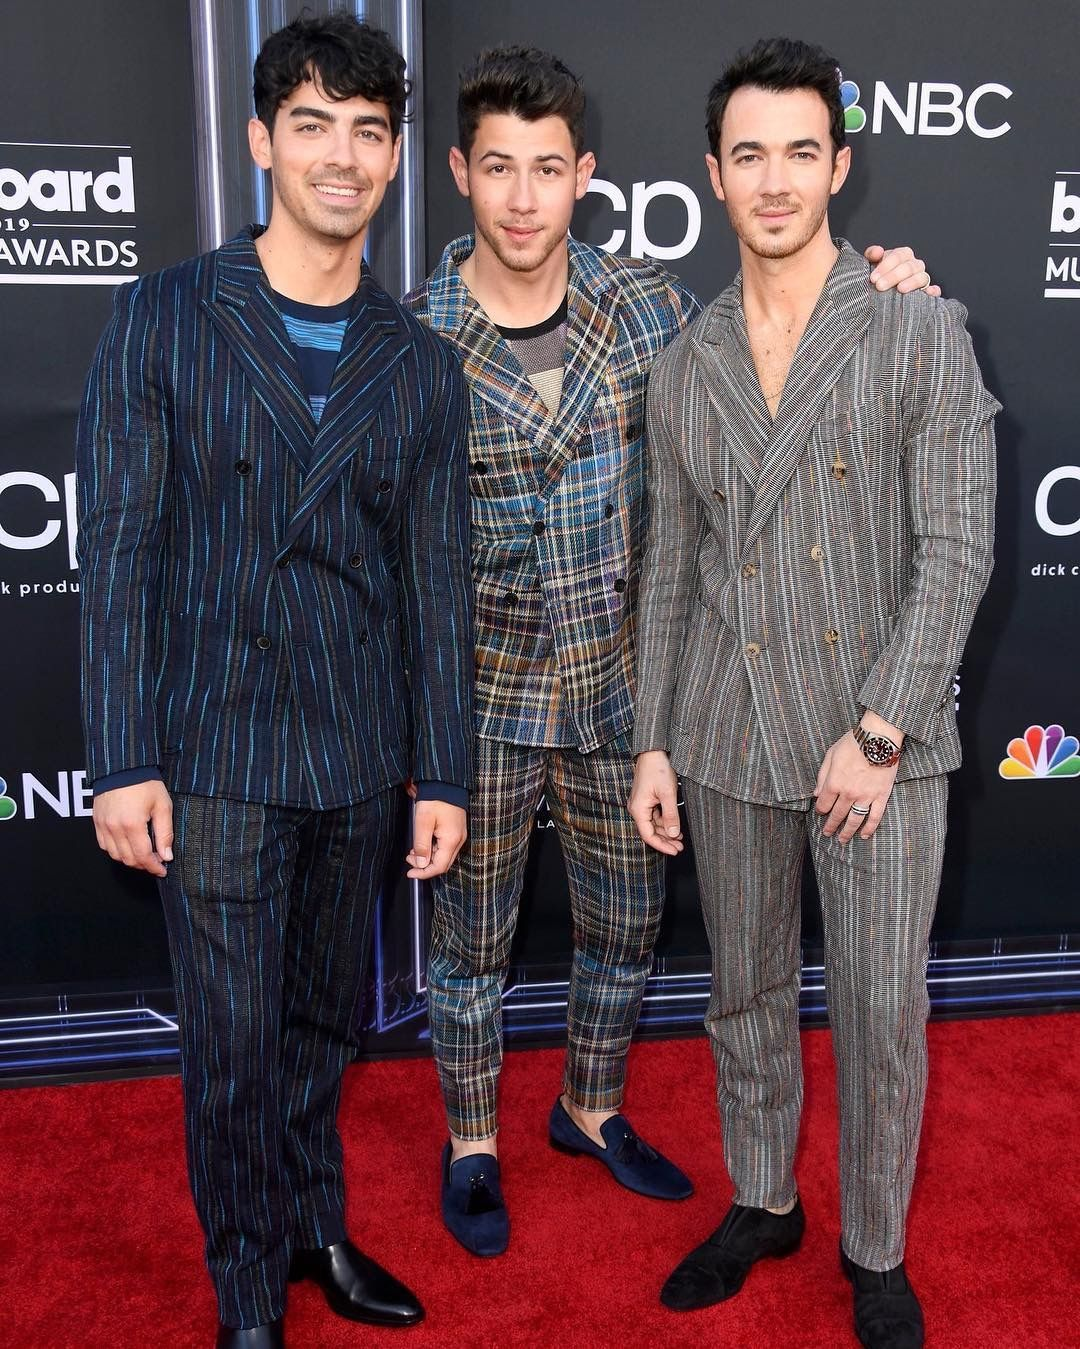 Jonas Brothers At Billboard Music Awards 2019 Wear SS19